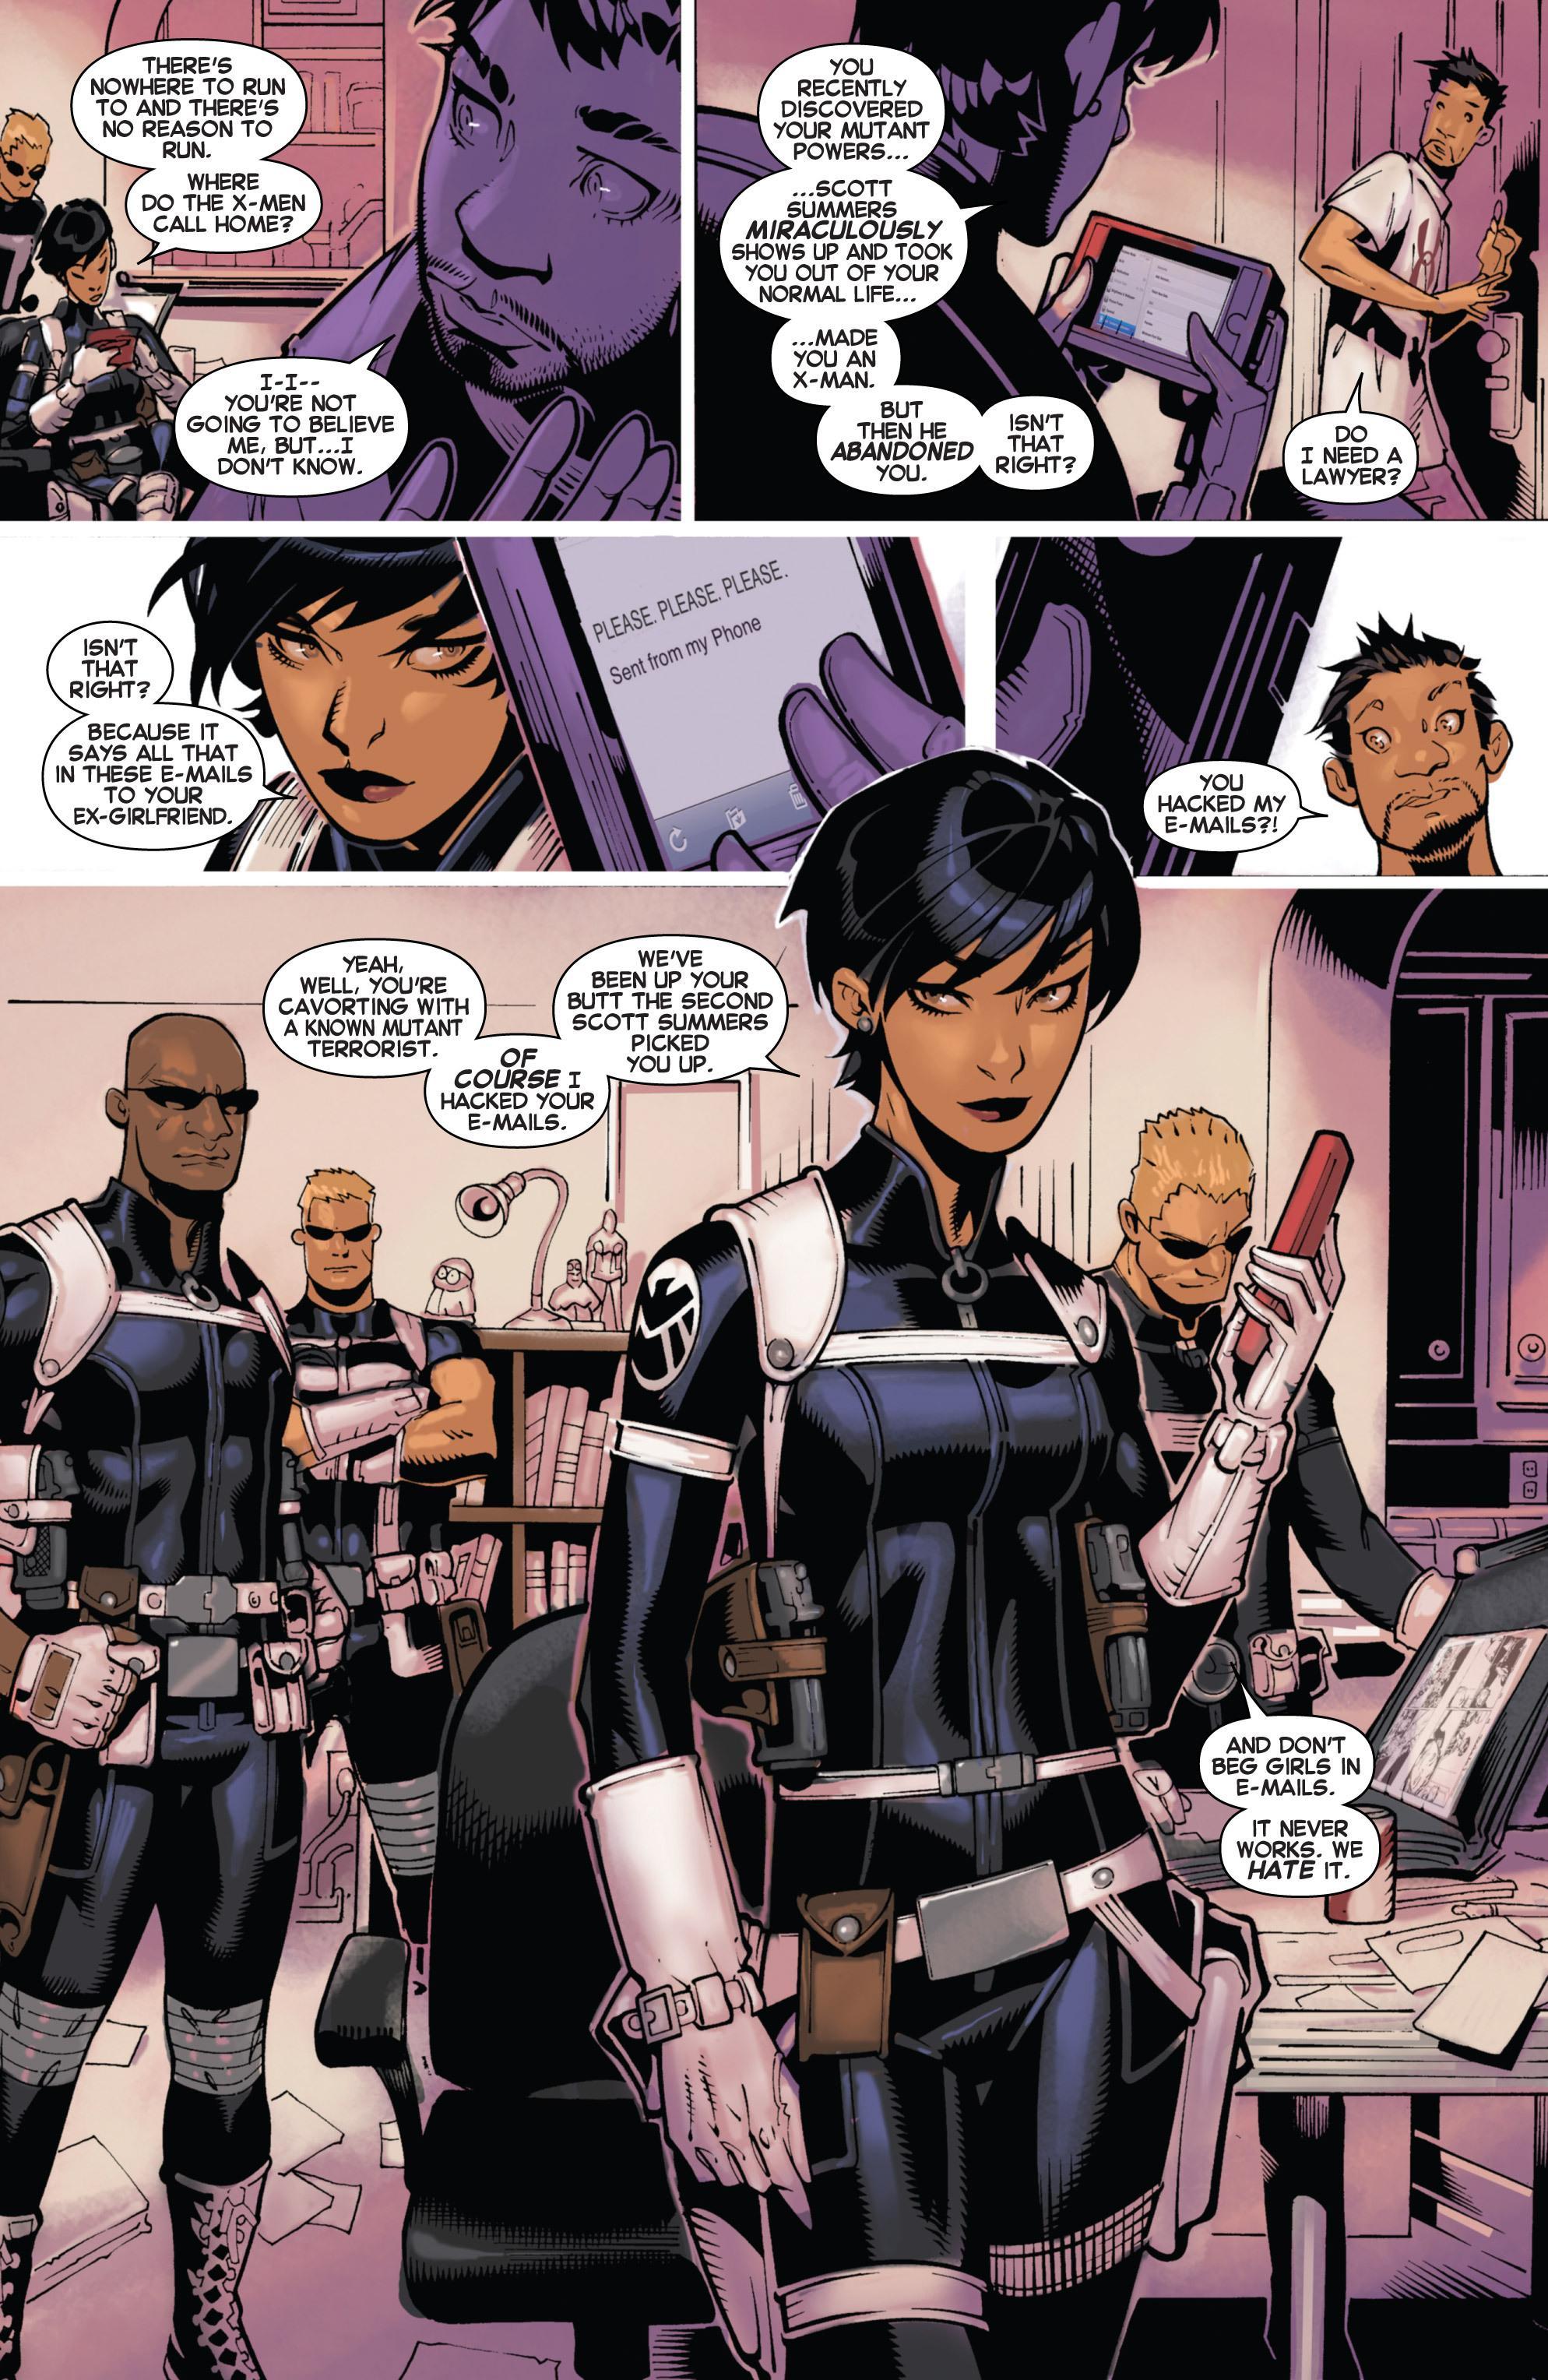 Read online Uncanny X-Men (2013) comic -  Issue # _TPB 4 - vs. S.H.I.E.L.D - 7